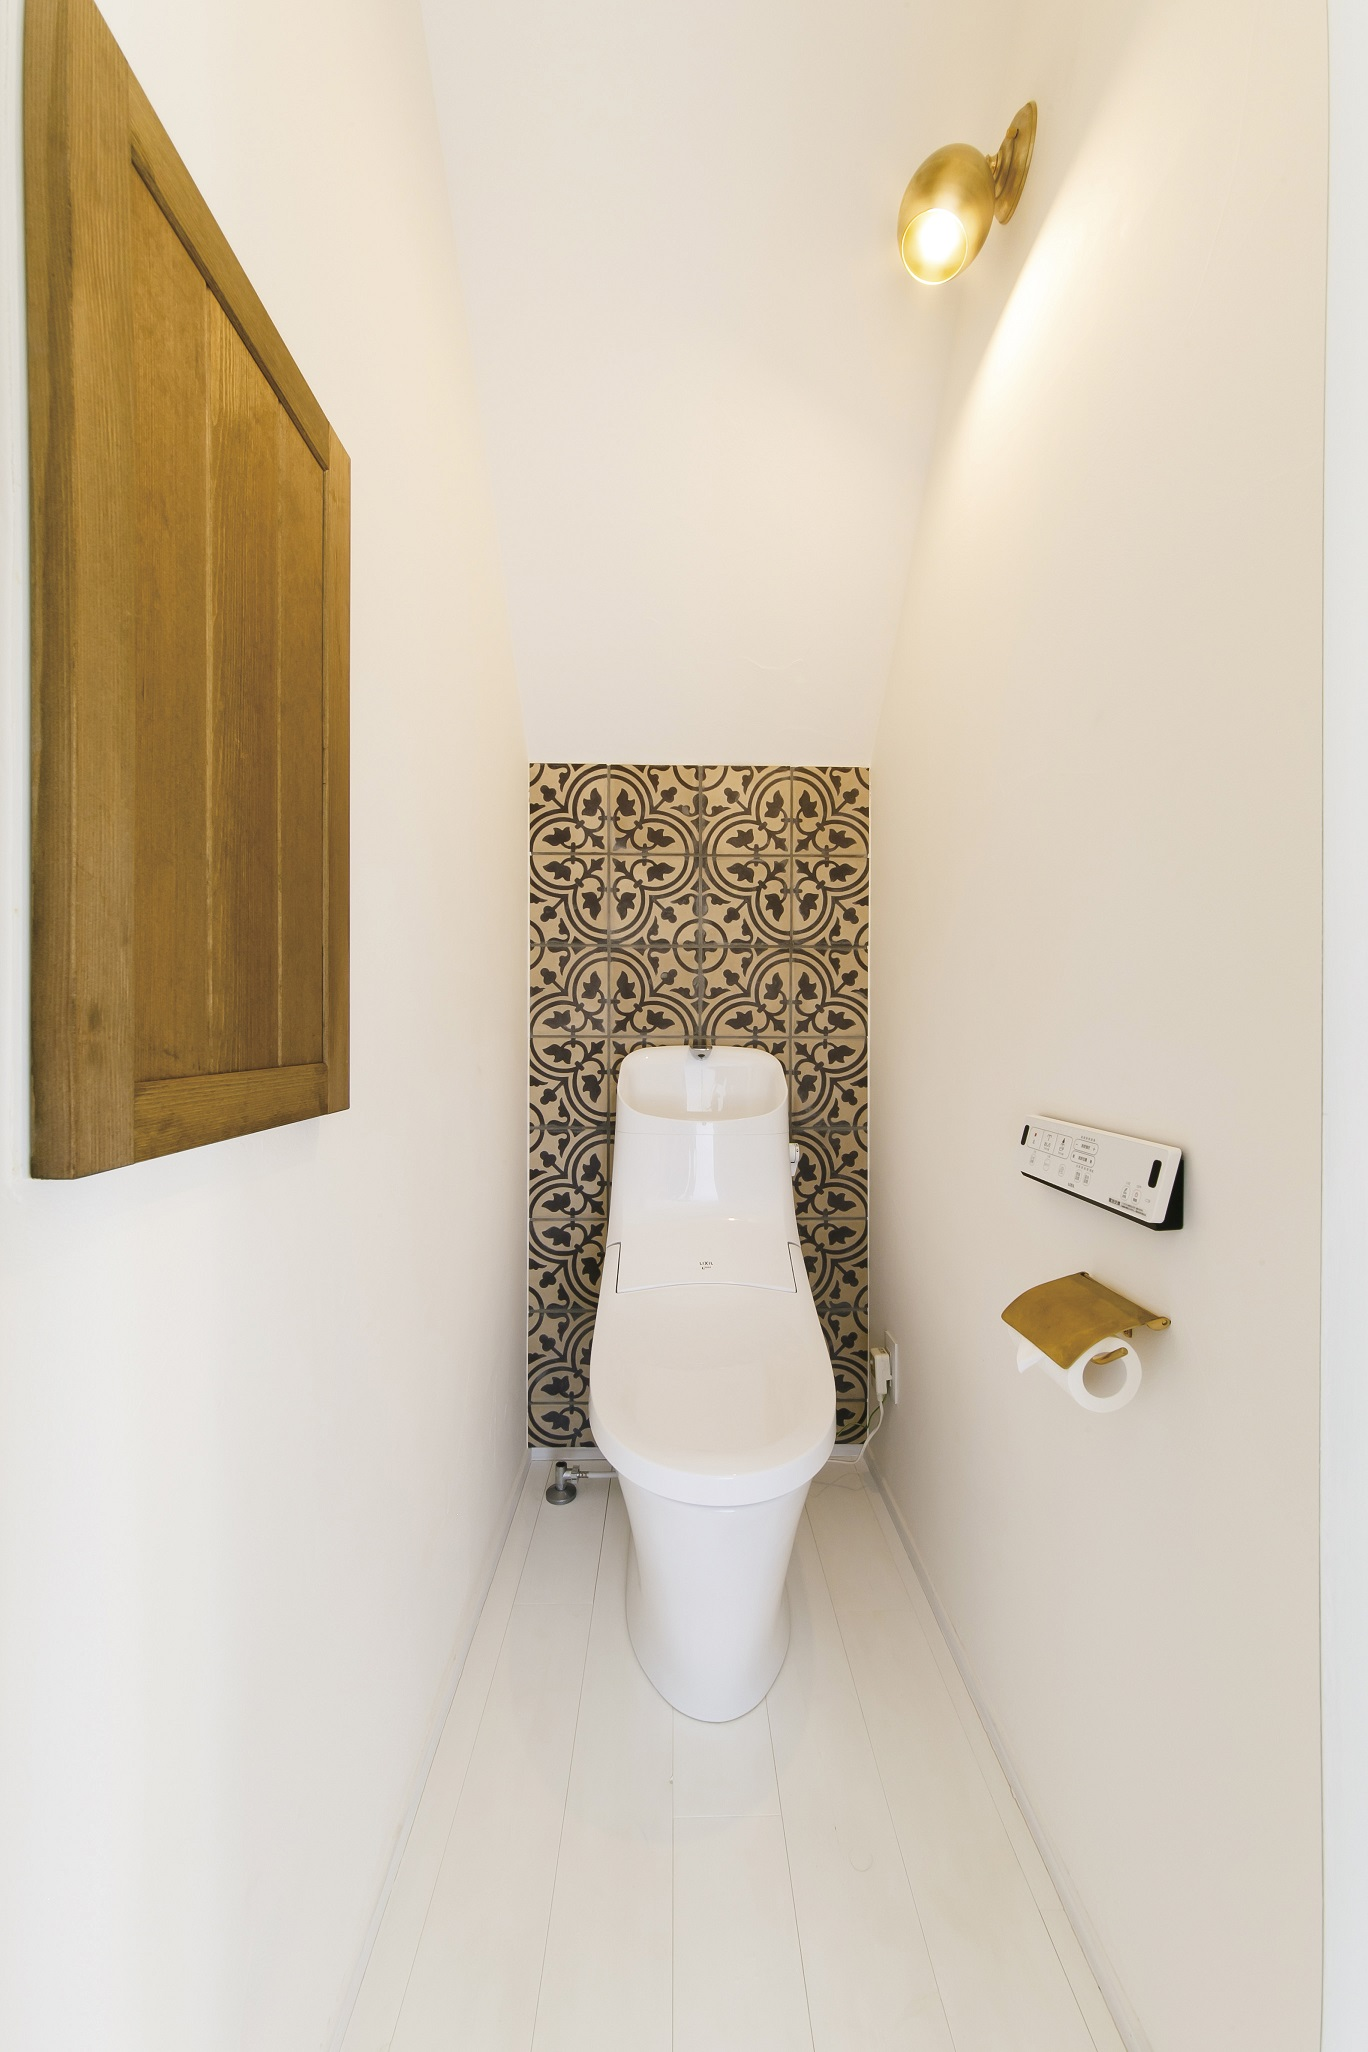 E様邸 3276 トイレ